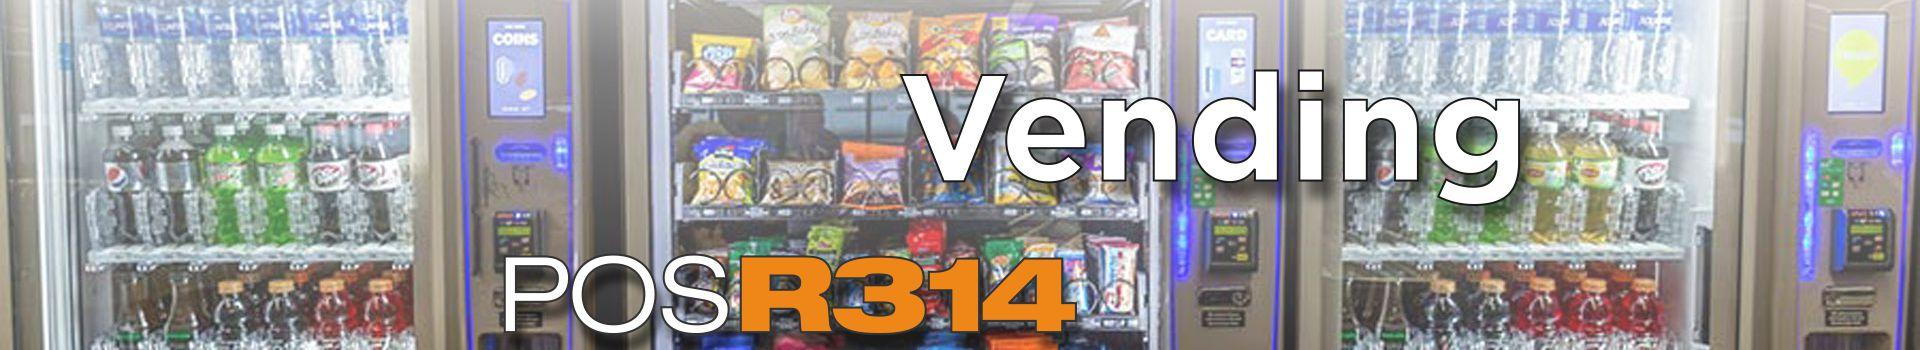 POS R314 - Vending